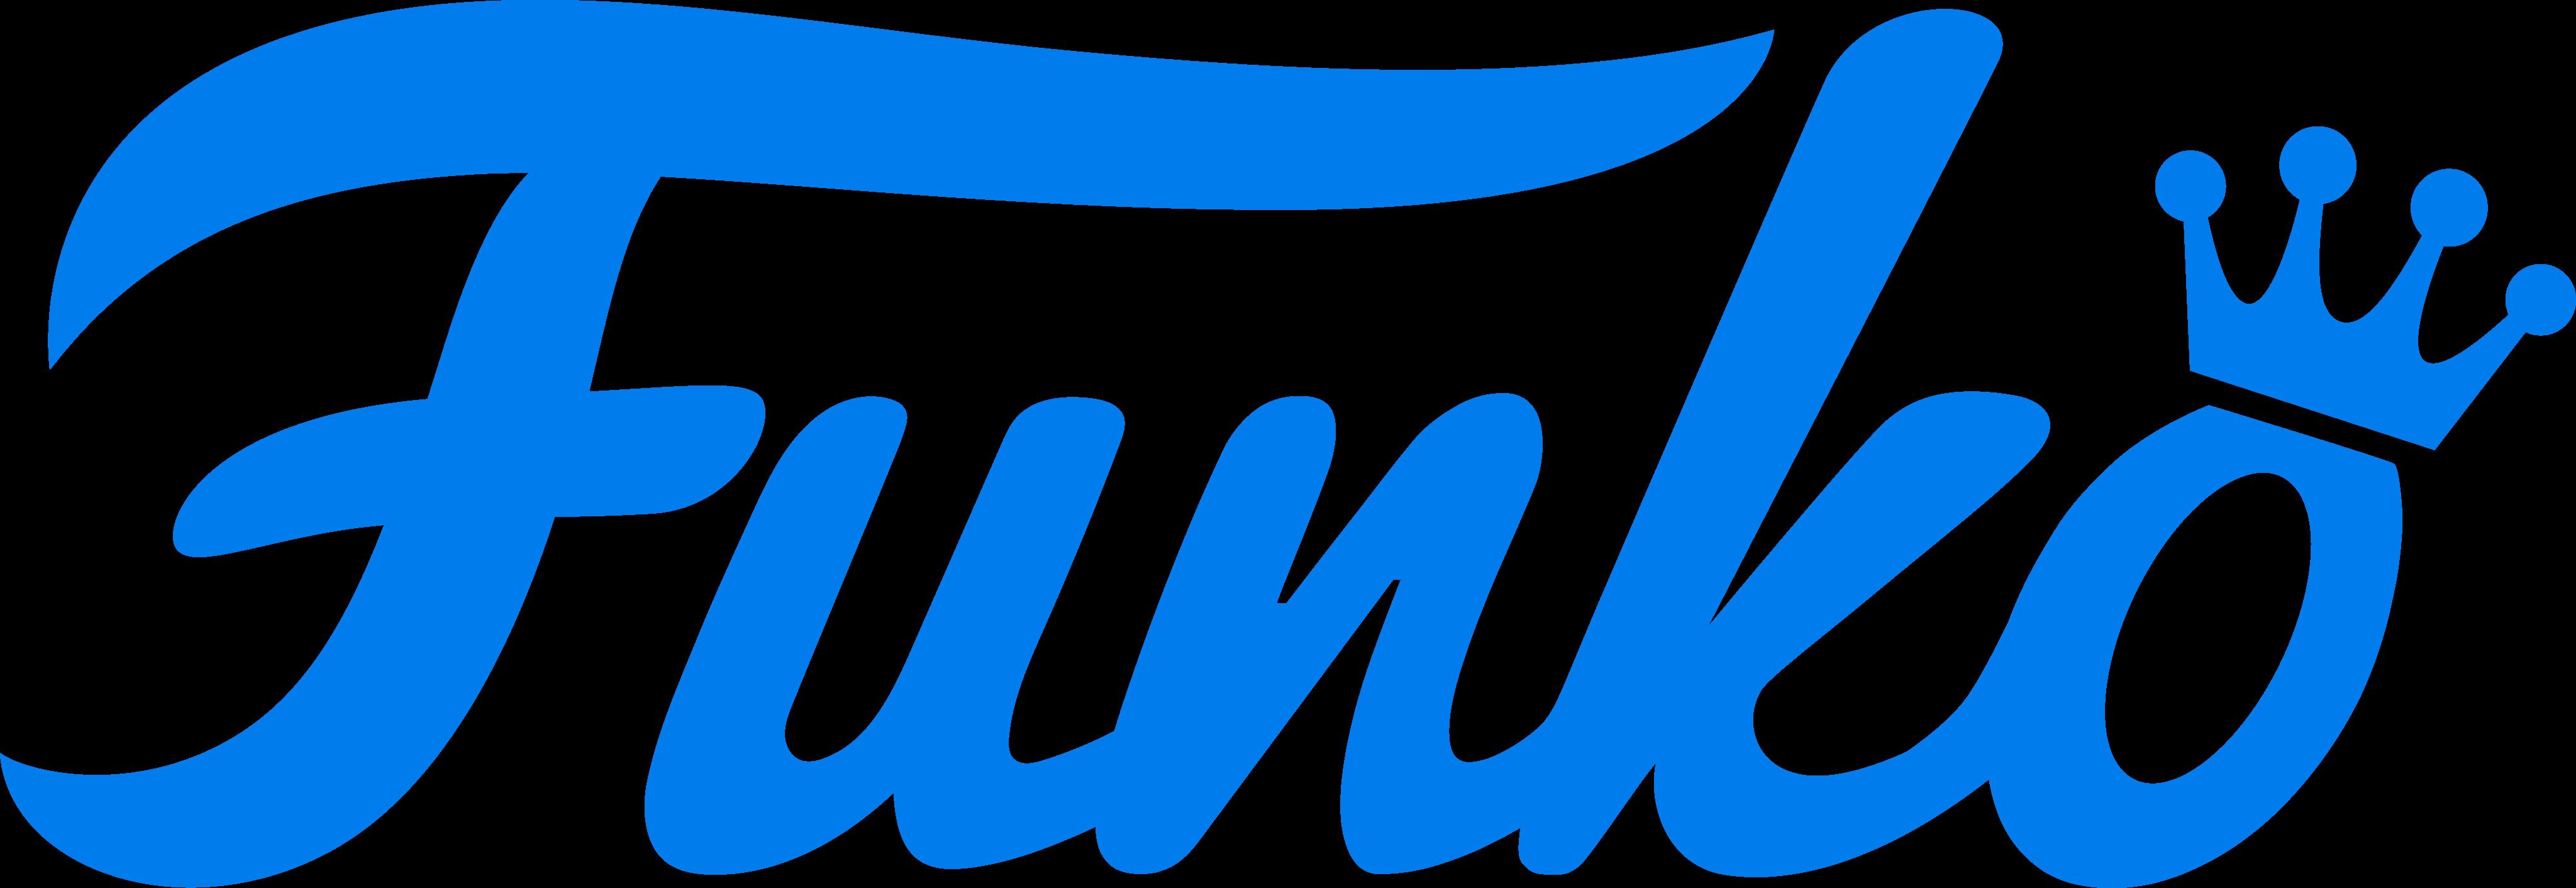 funko logo 1 - Funko Logo